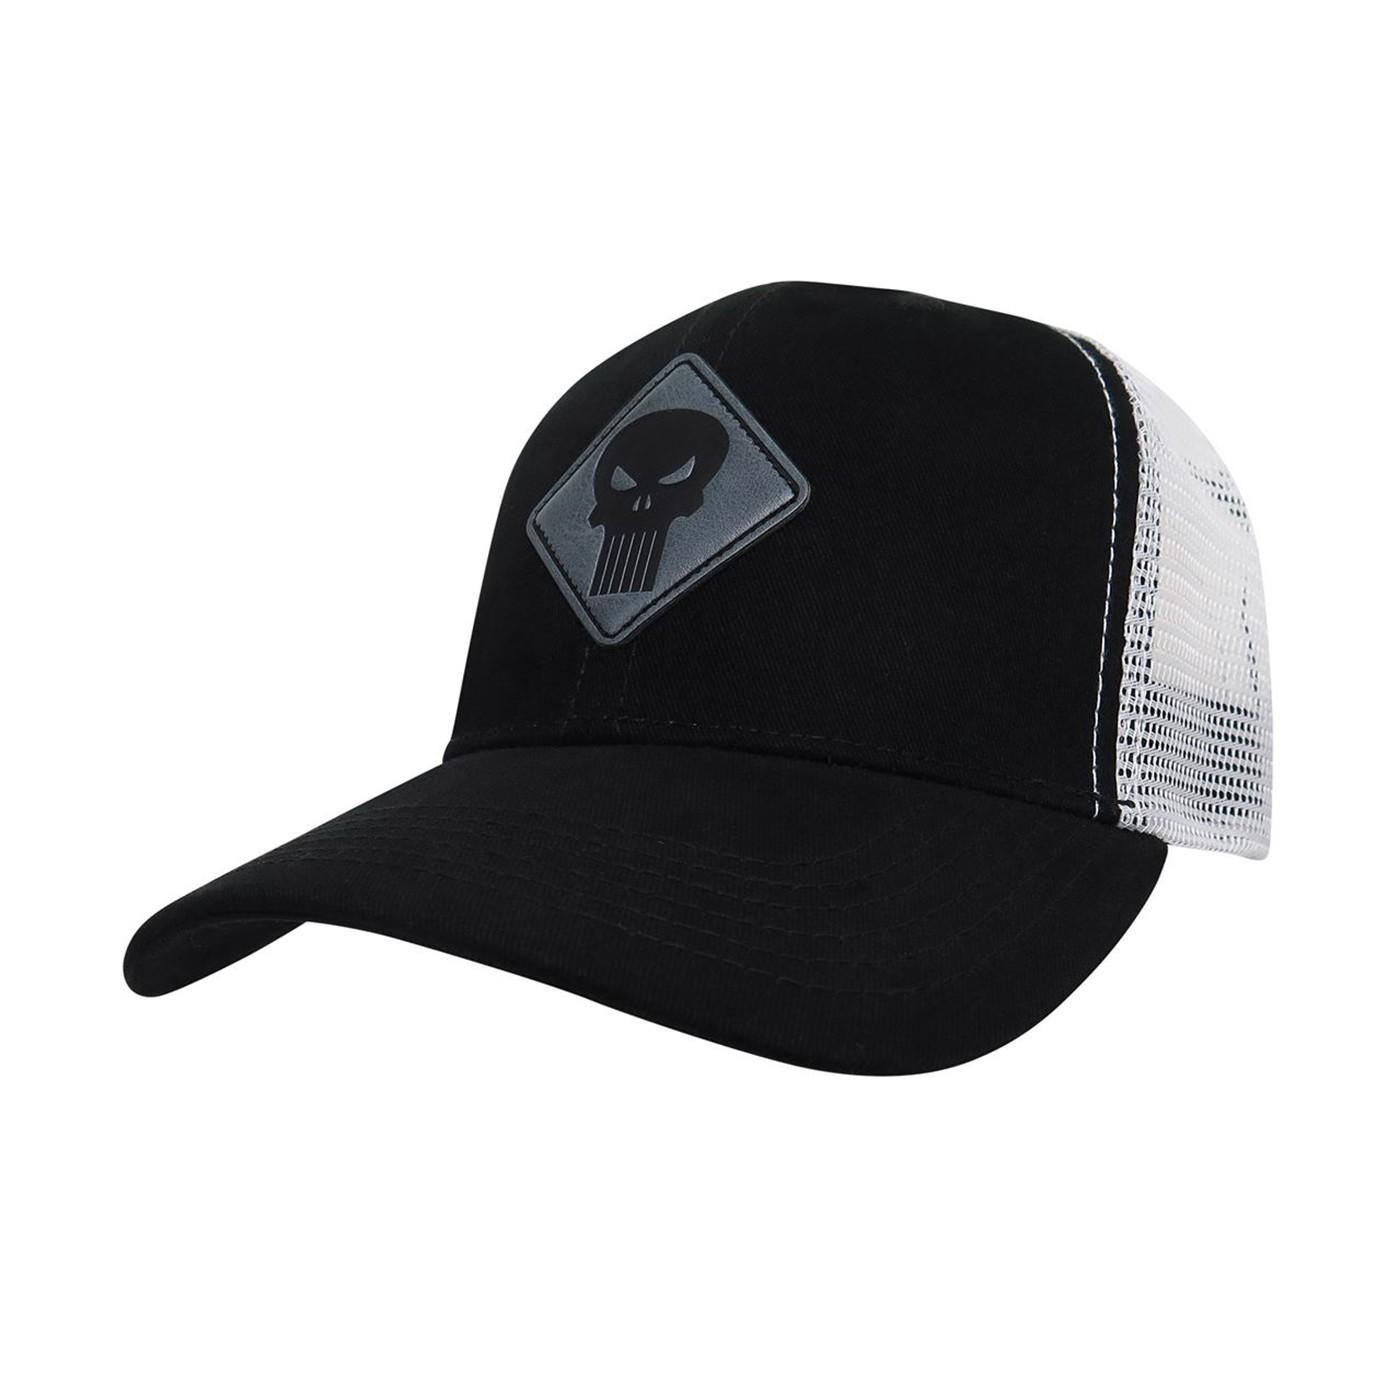 Punisher Scout Adjustable Trucker Snapback Hat